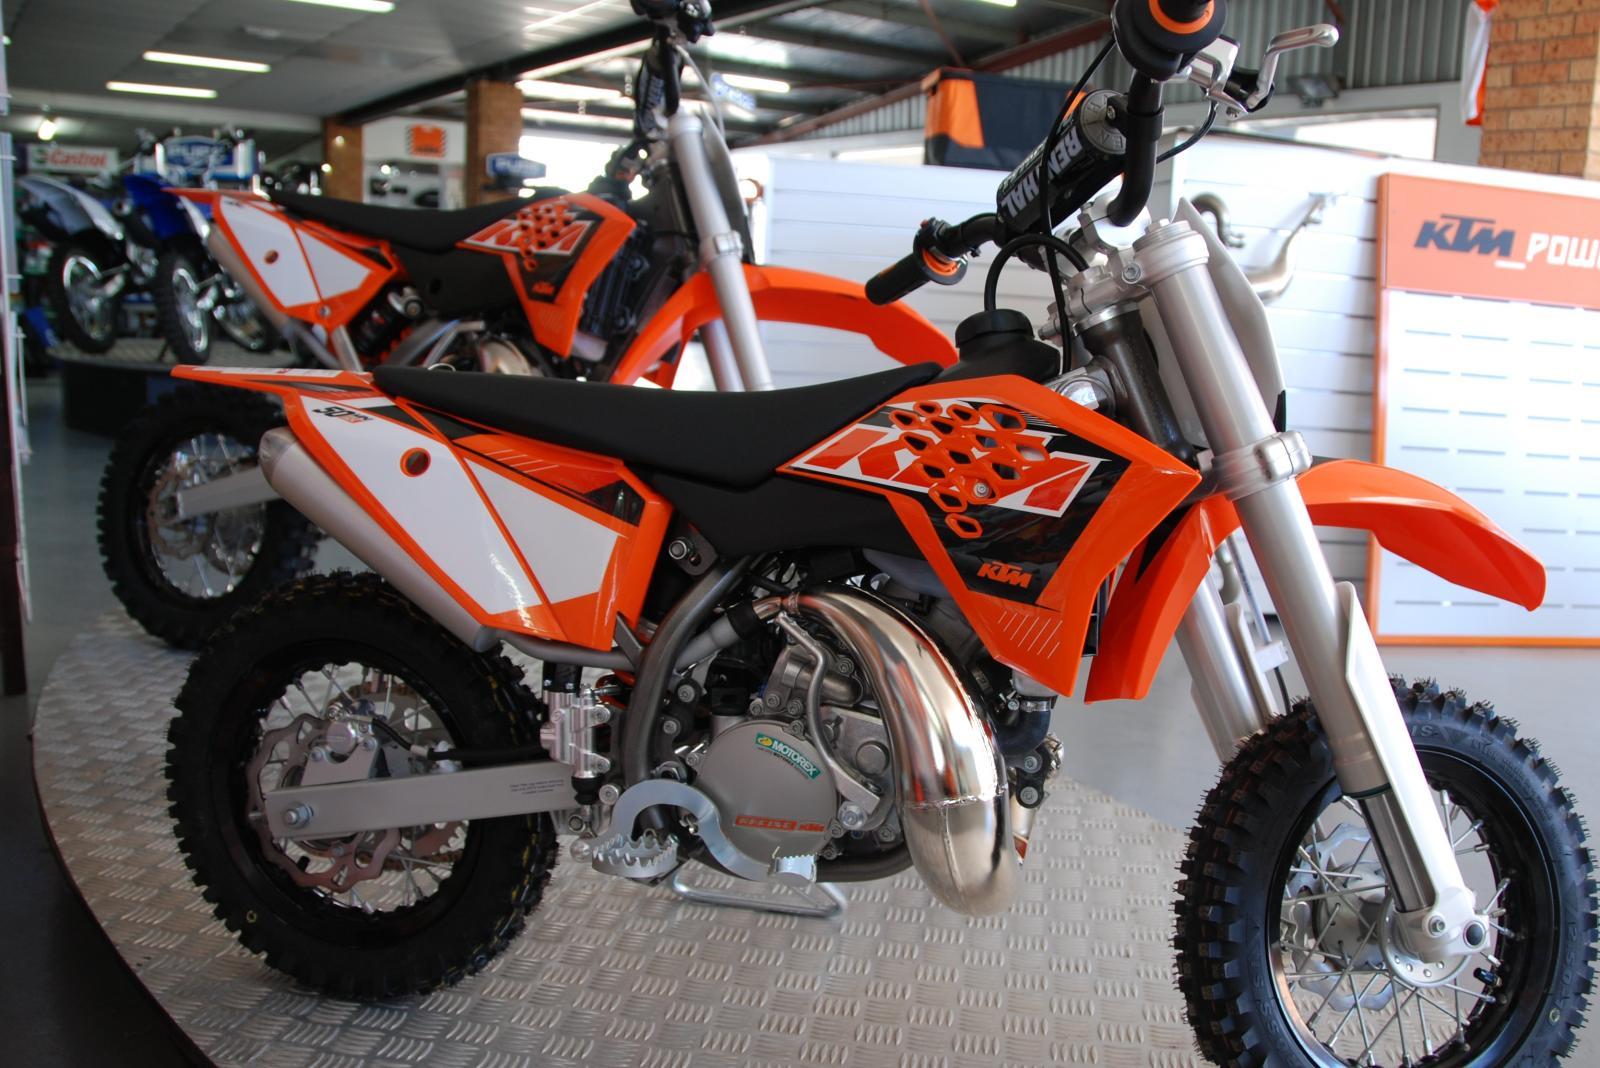 Ktm 2015 Models Arrive At Inverell Motorcycles Inverell